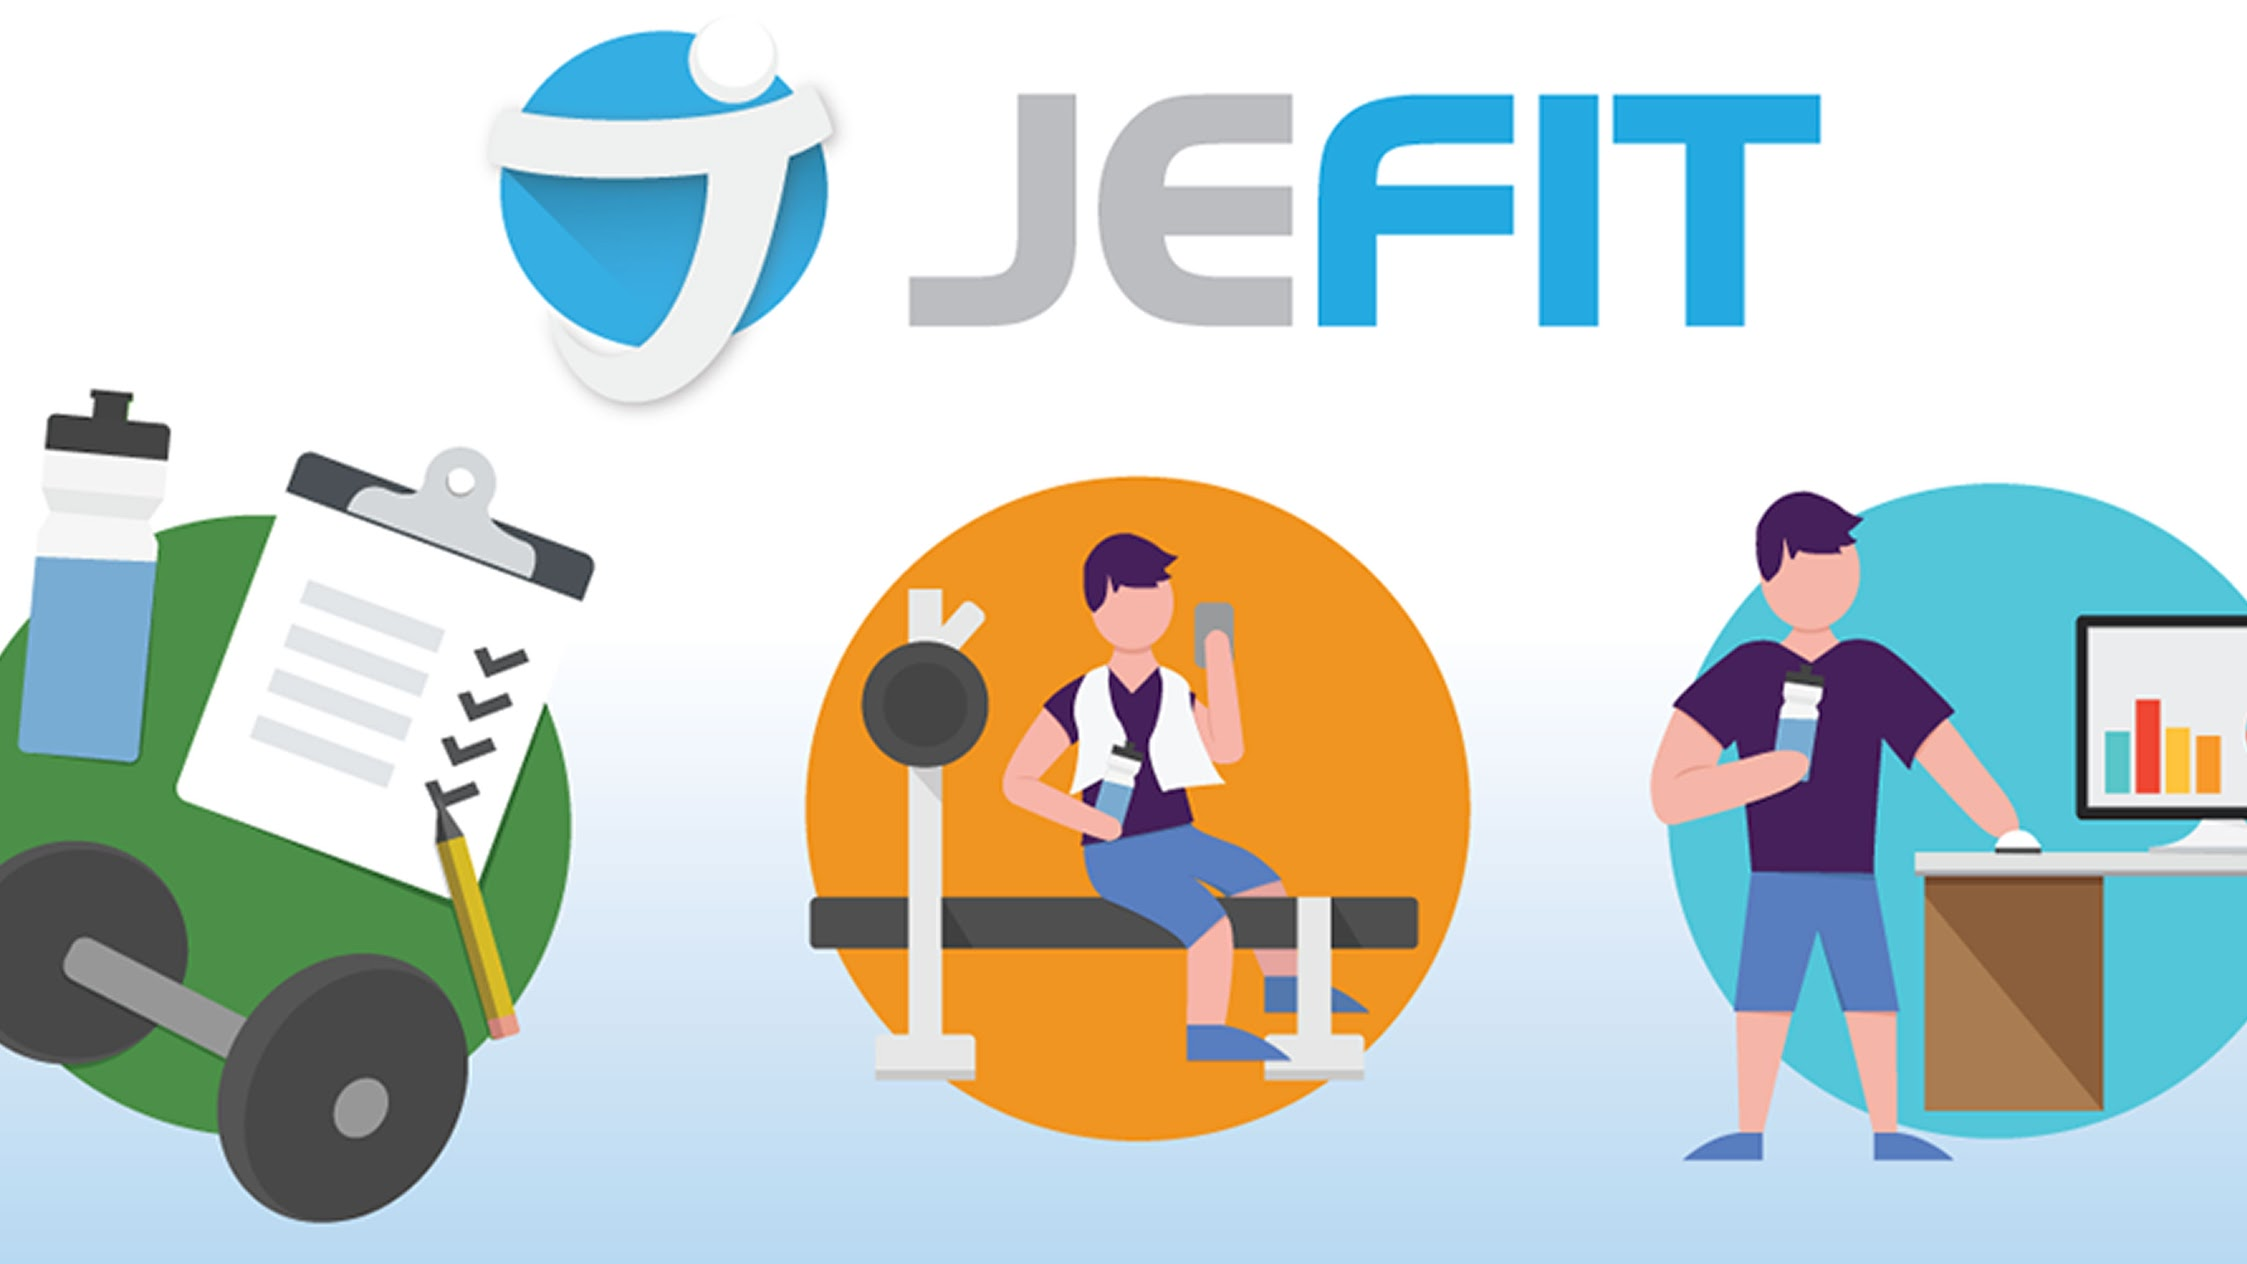 Jefit Inc.